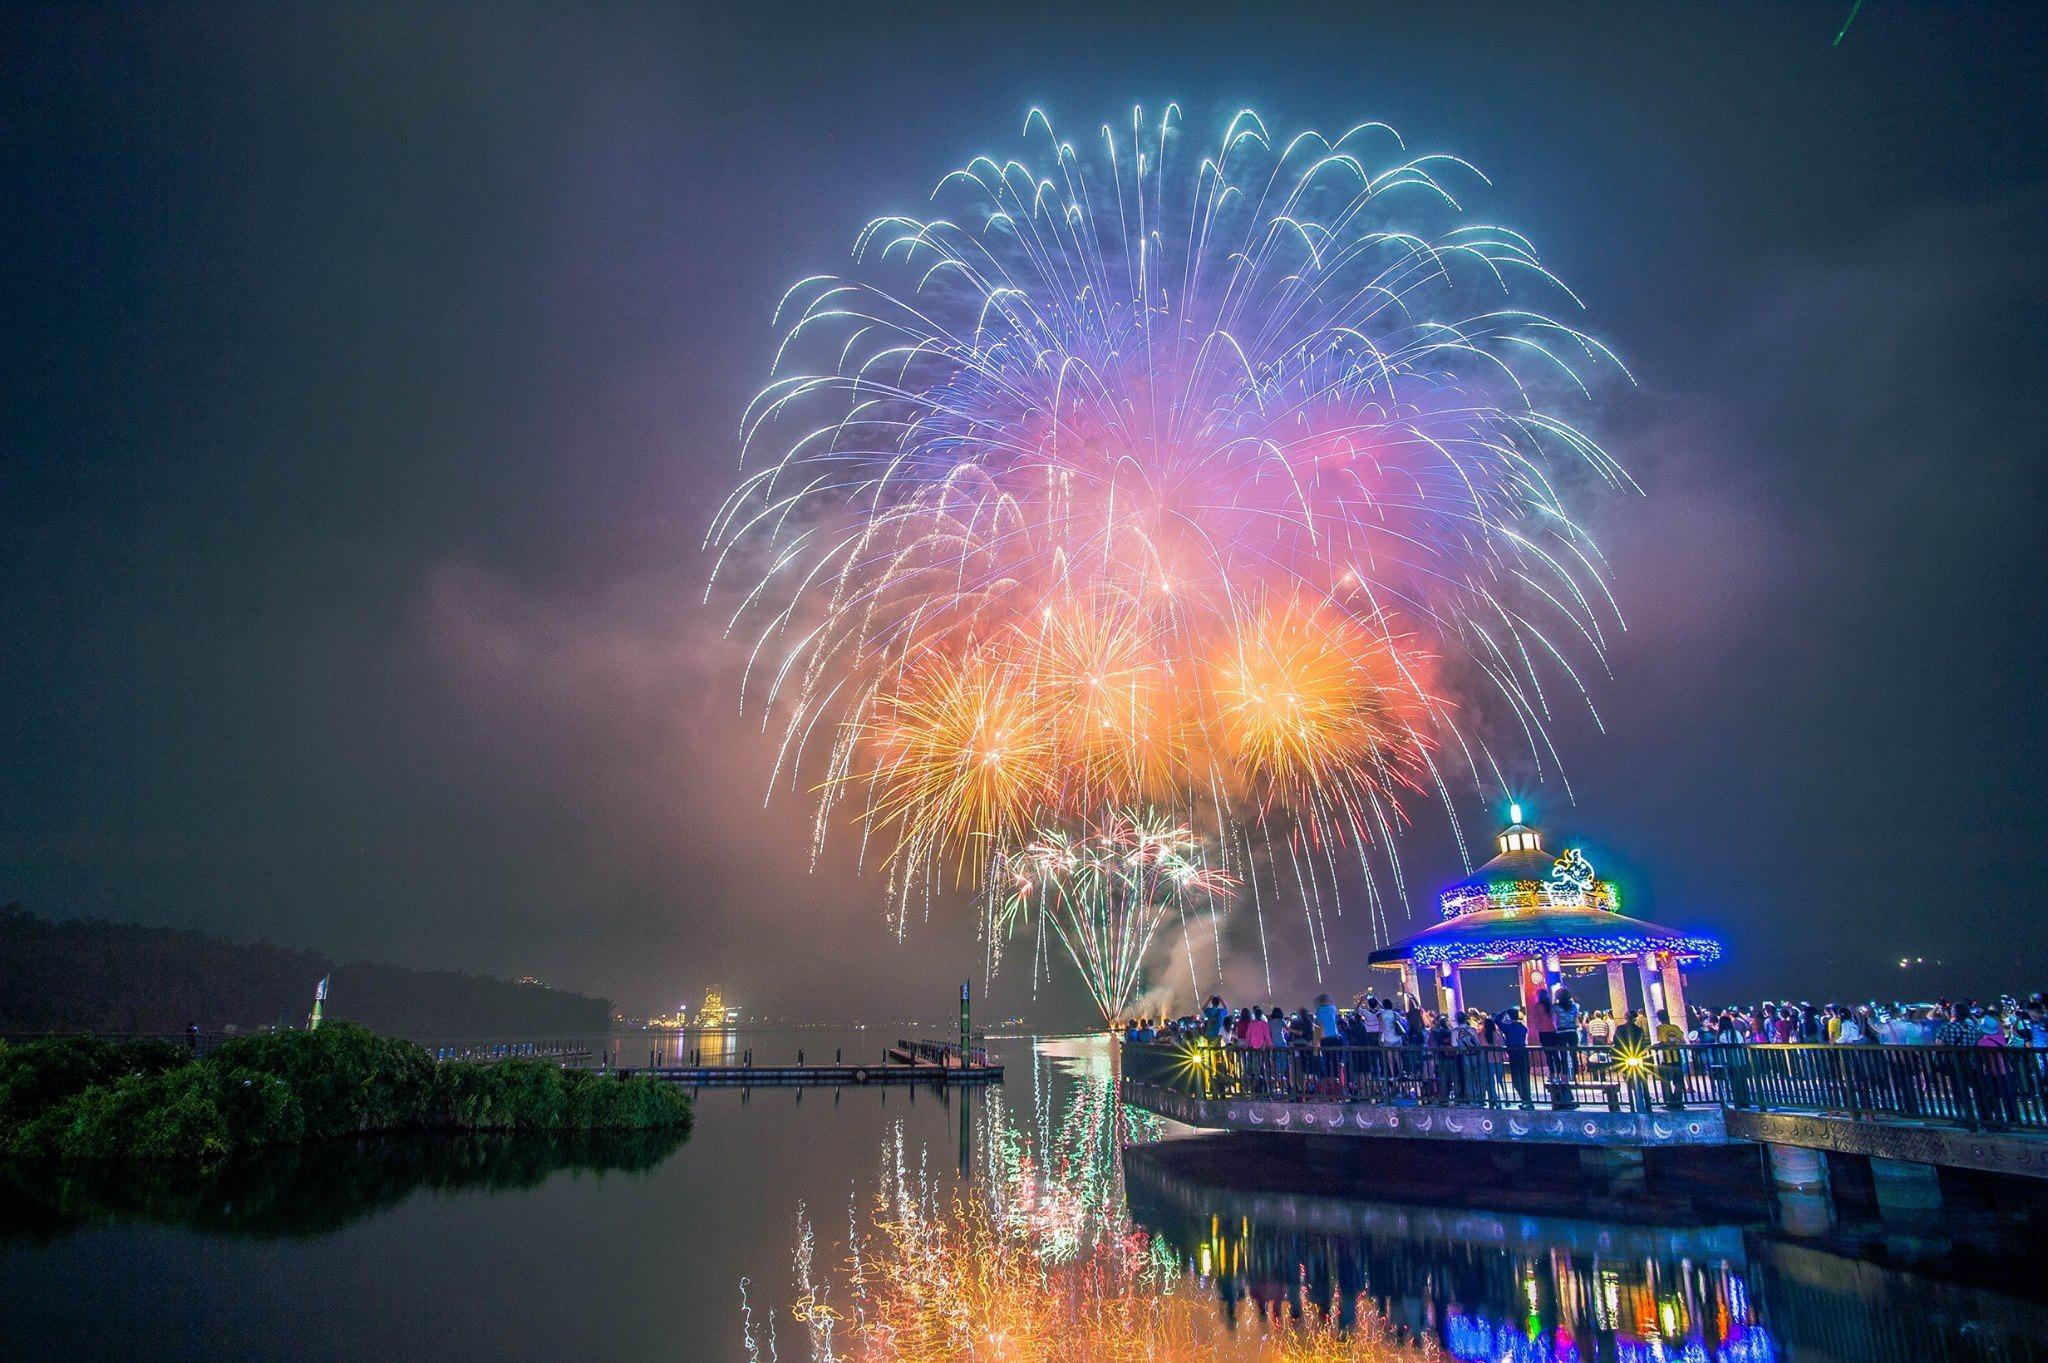 2019 Sun Moon Lake Cycling, Music & Fireworks Festival